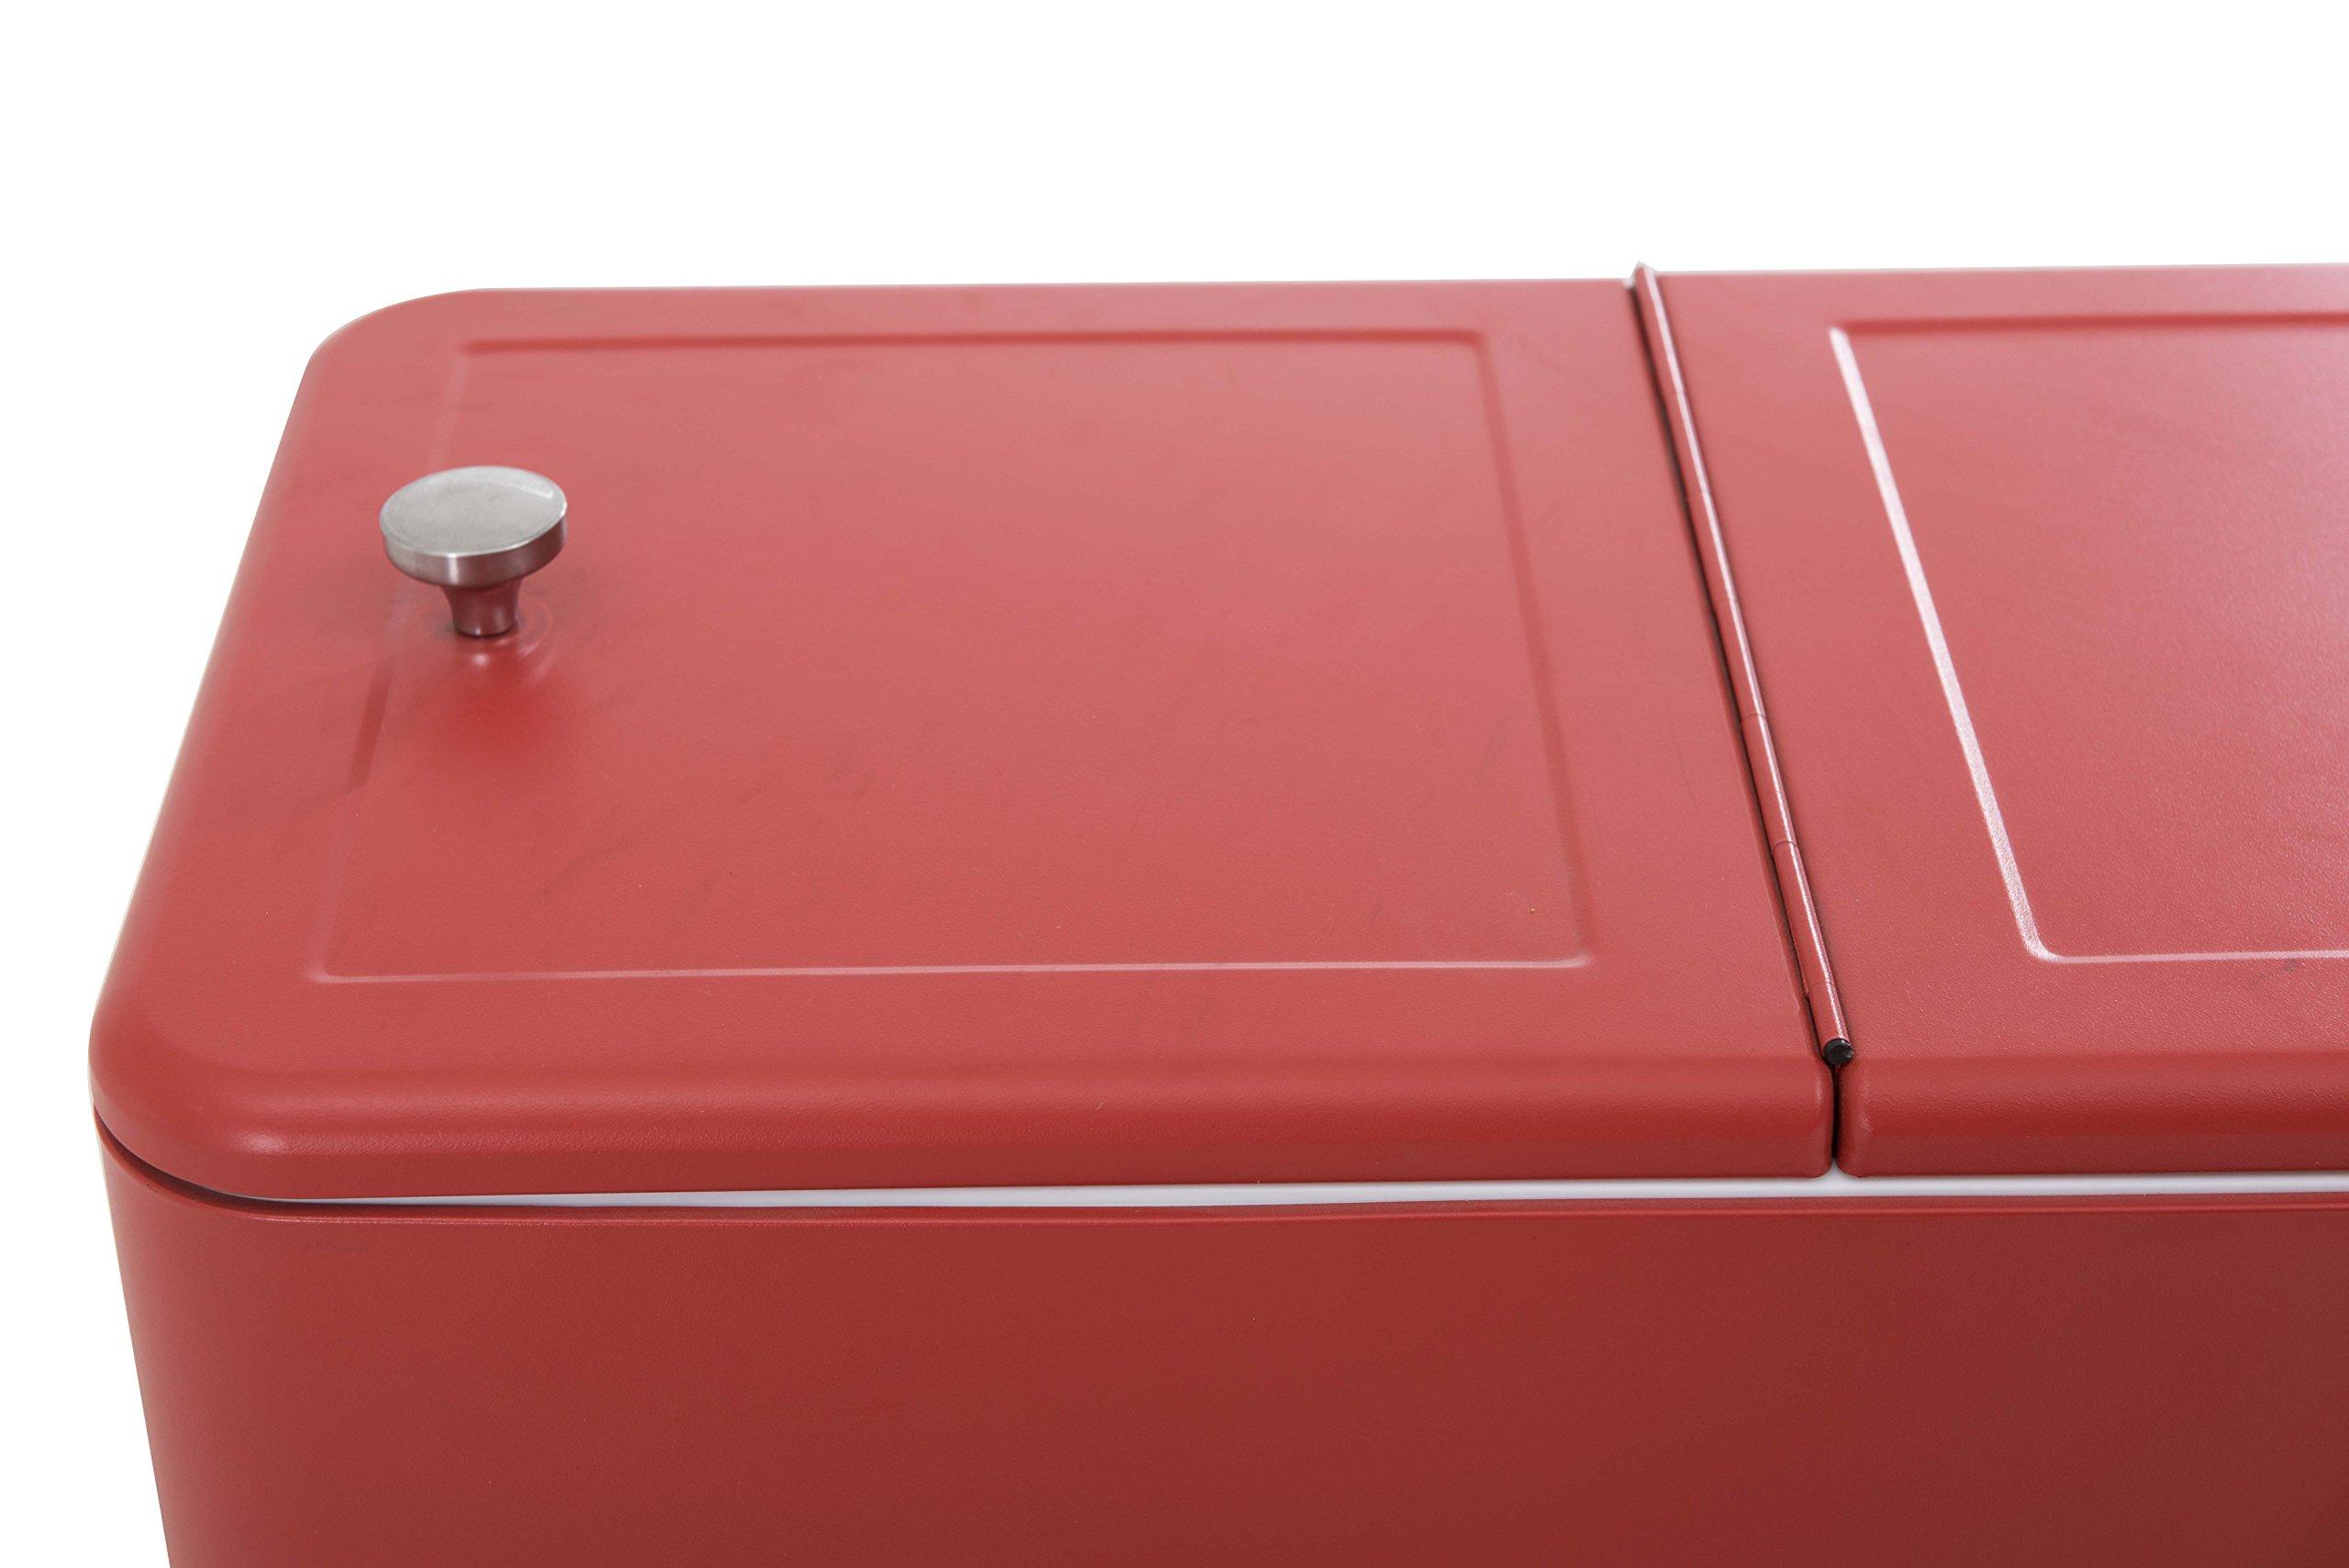 Sunjoy L-BC153PST 60 quart Wheeled Beverage Cooler in Red by sunjoy (Image #5)